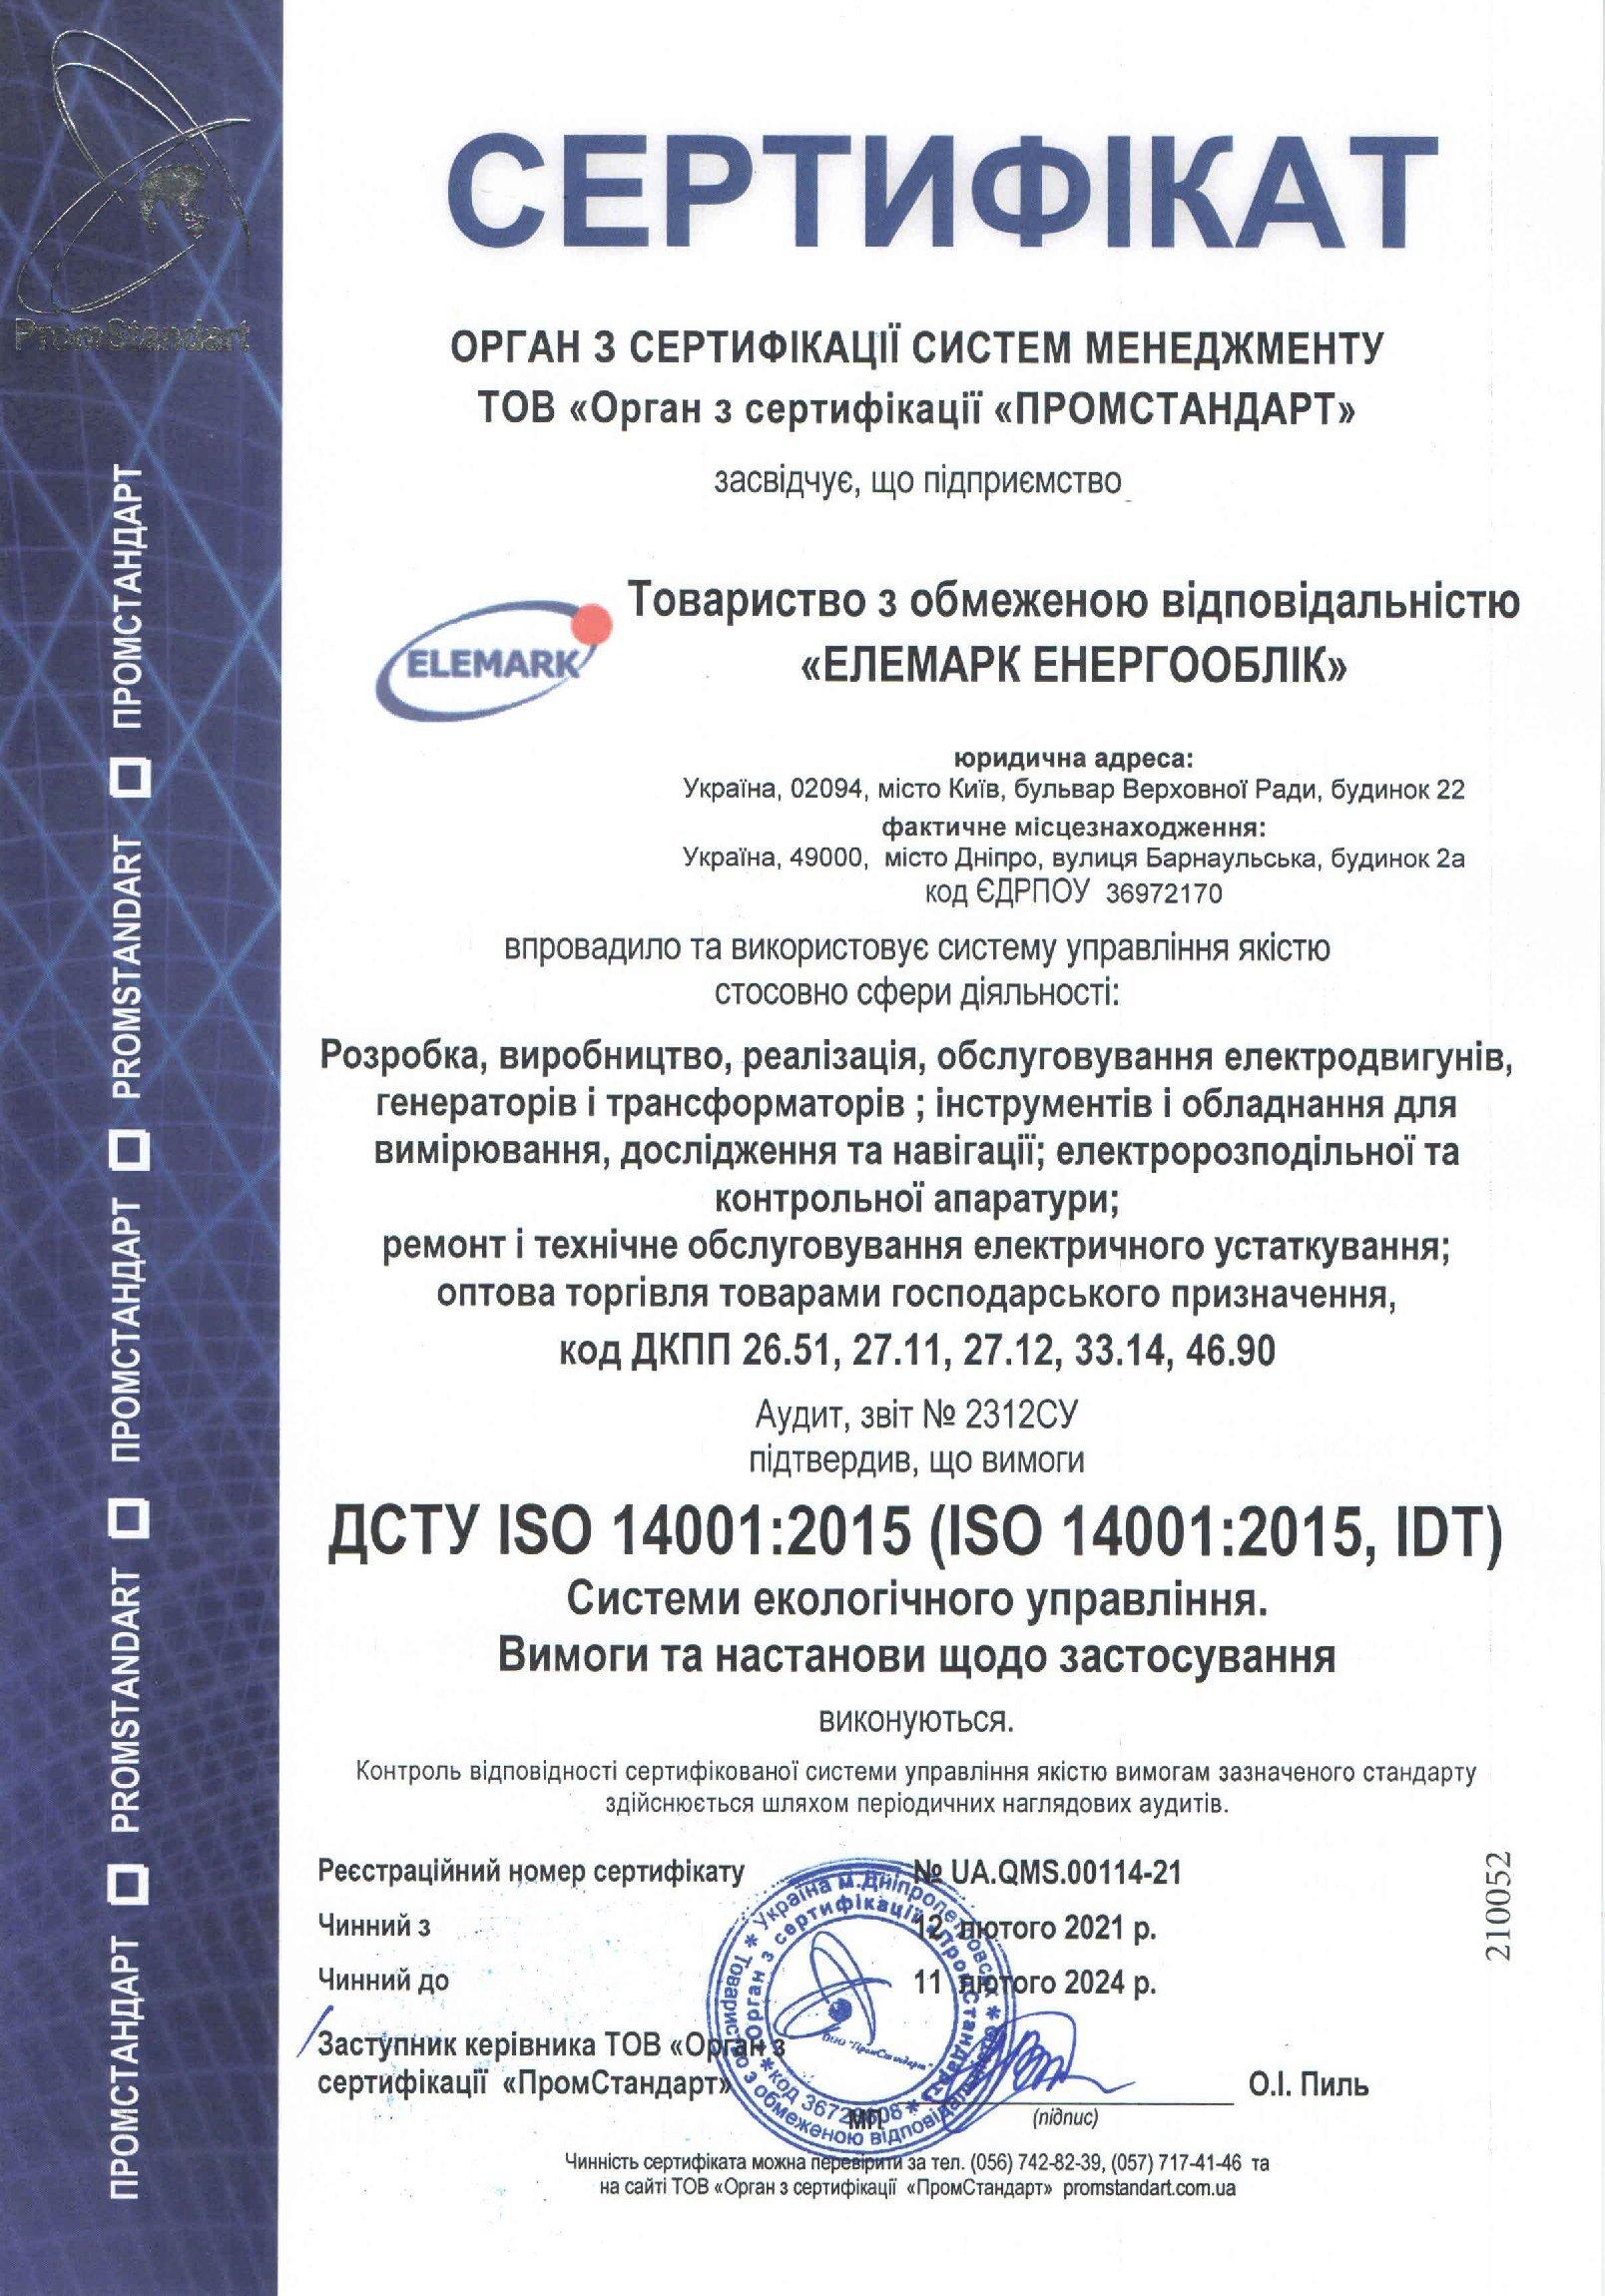 СЕРТИФІКАТ - 14001 (ЕНЕРГООБЛІК)_00001